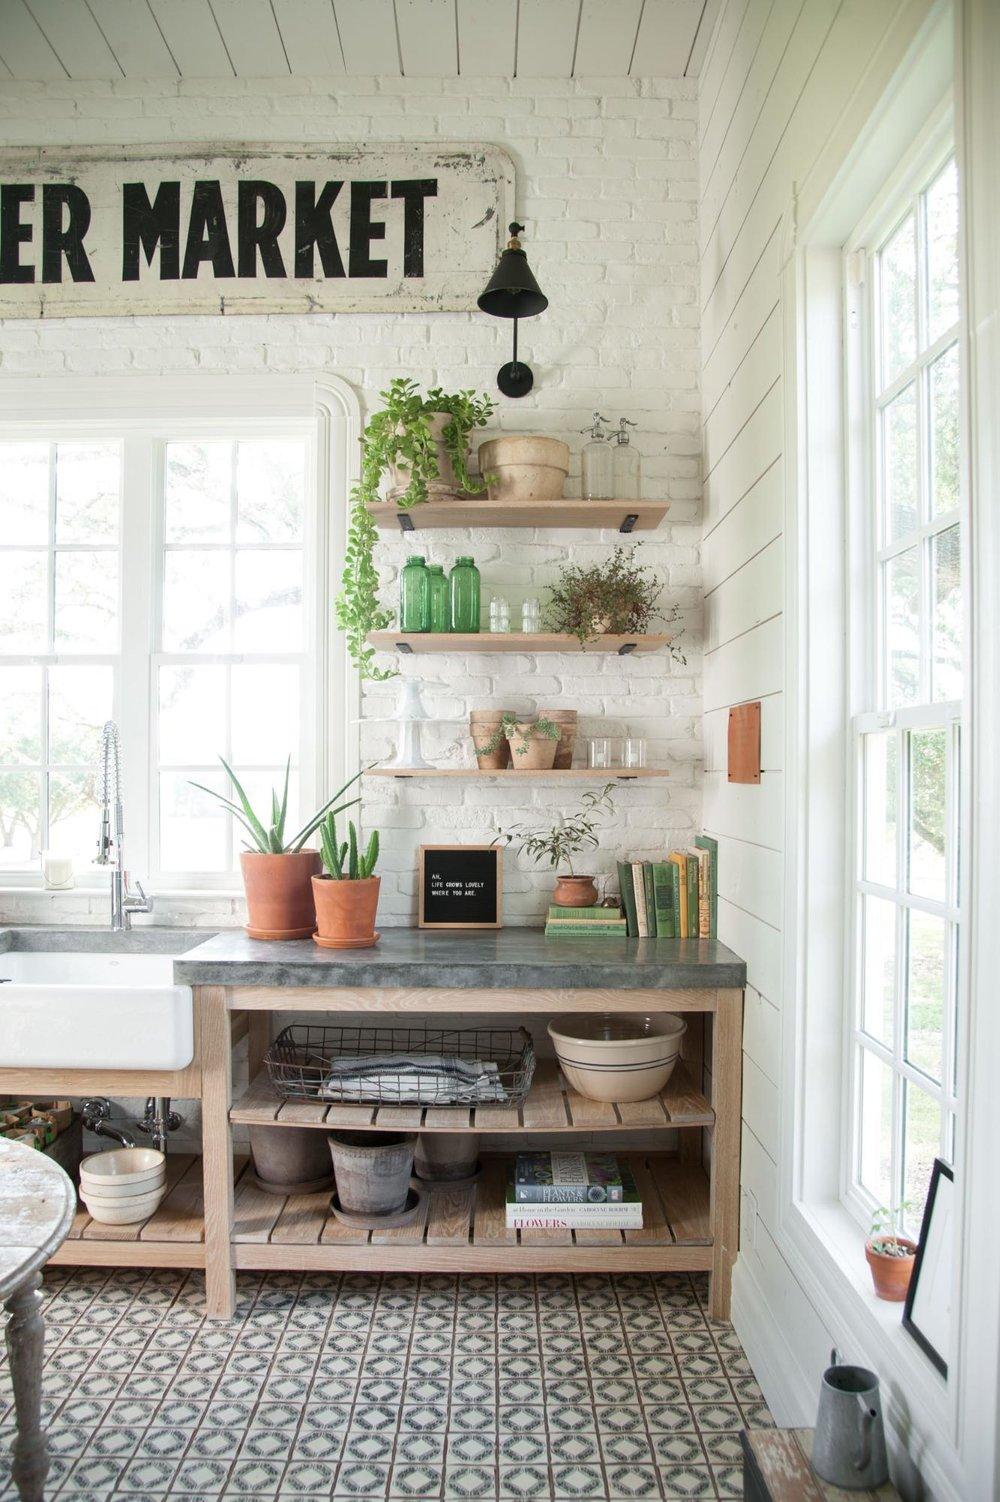 Top 10 Best Interior Design Youtube Channels The Habitat